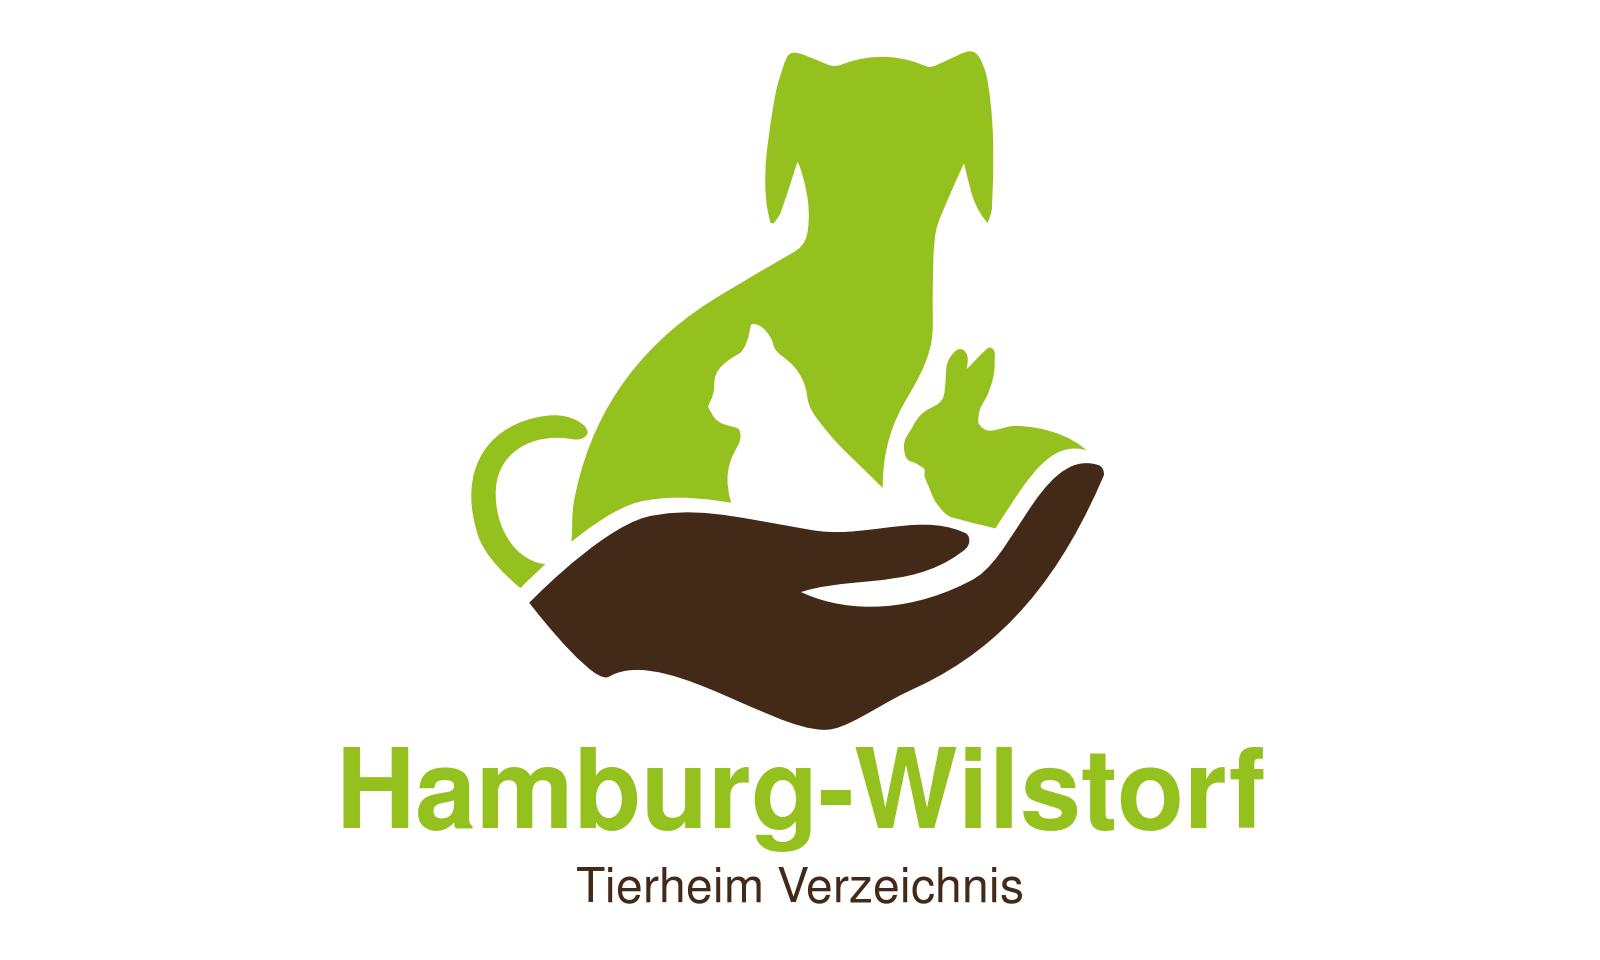 Tierheim Hamburg Wilstorf